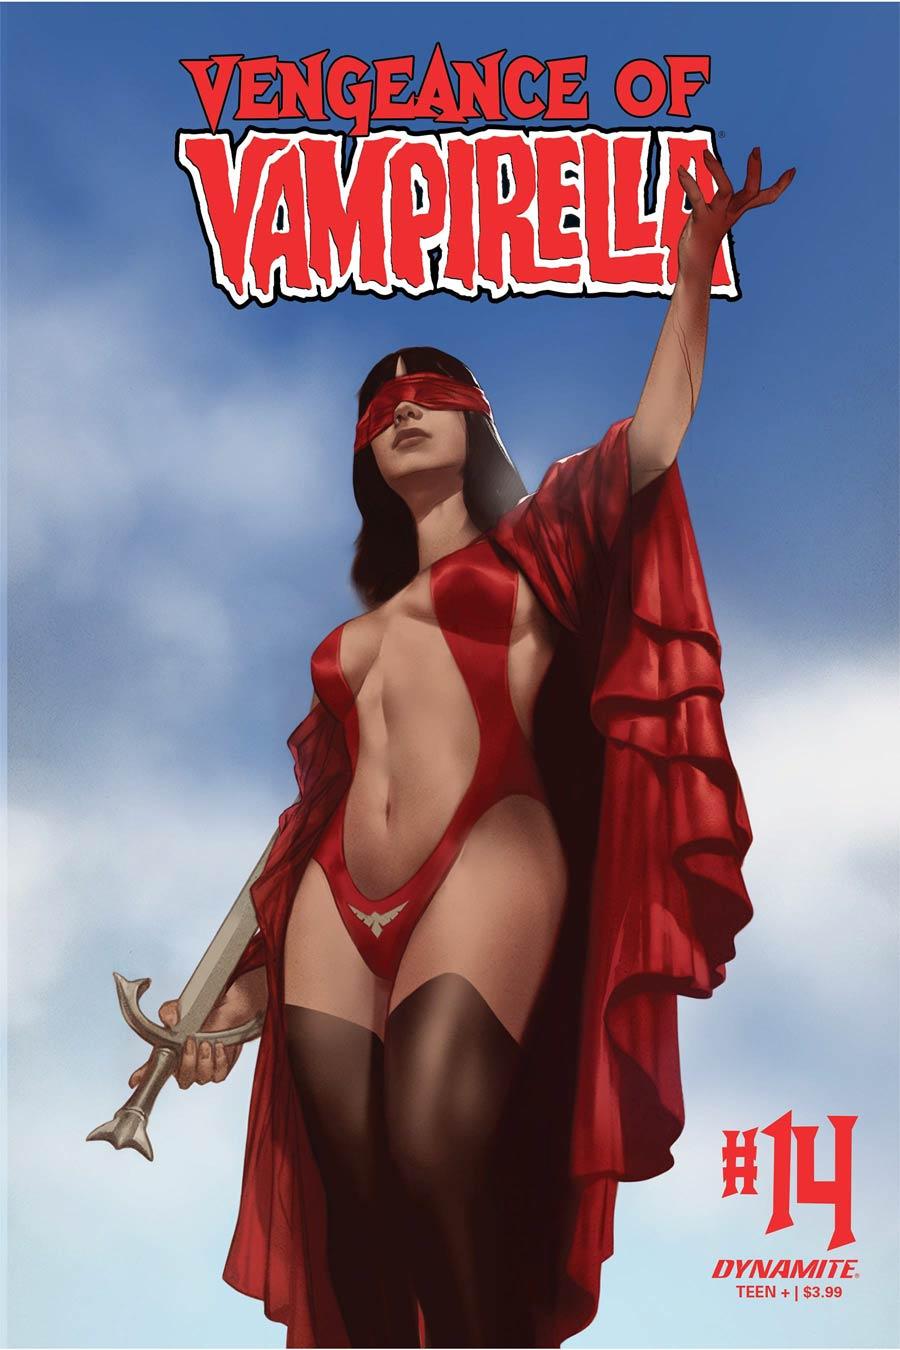 Vengeance Of Vampirella Vol 2 #14 Cover S Variant Ben Oliver Cover CGC Graded